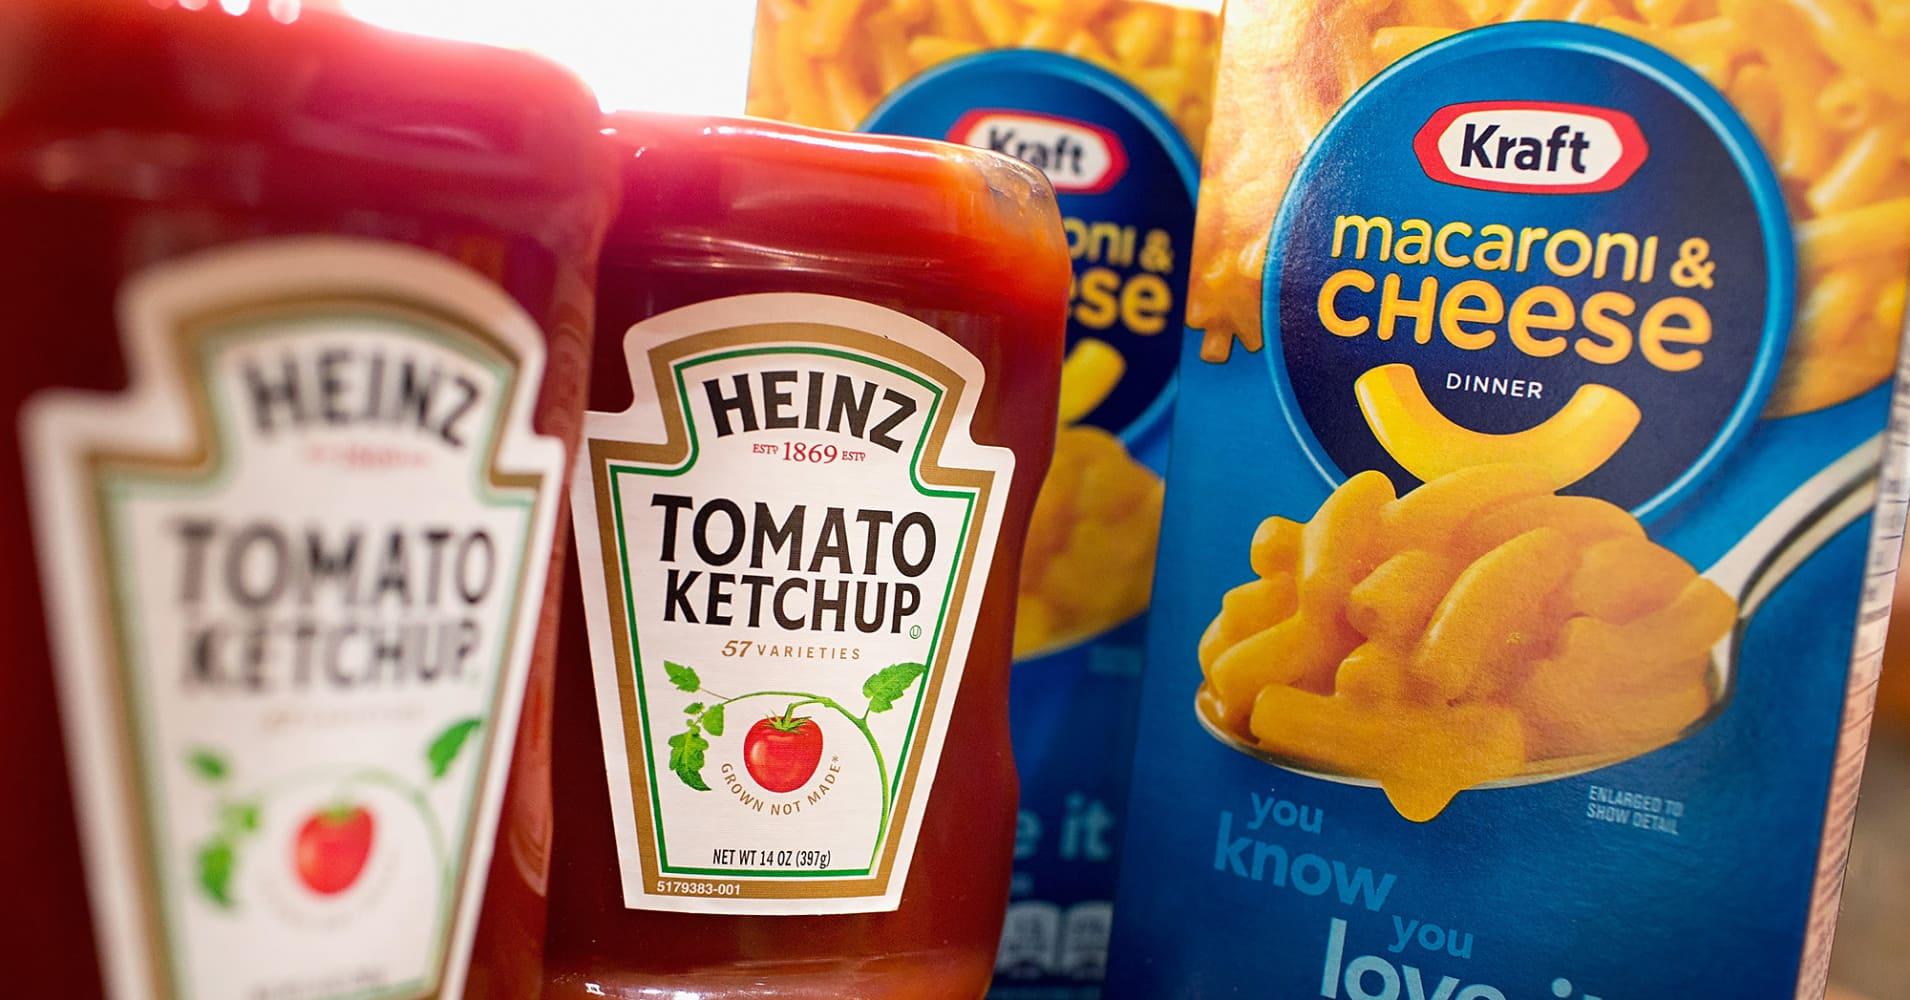 S&P places Kraft Heinz on CreditWatch negative